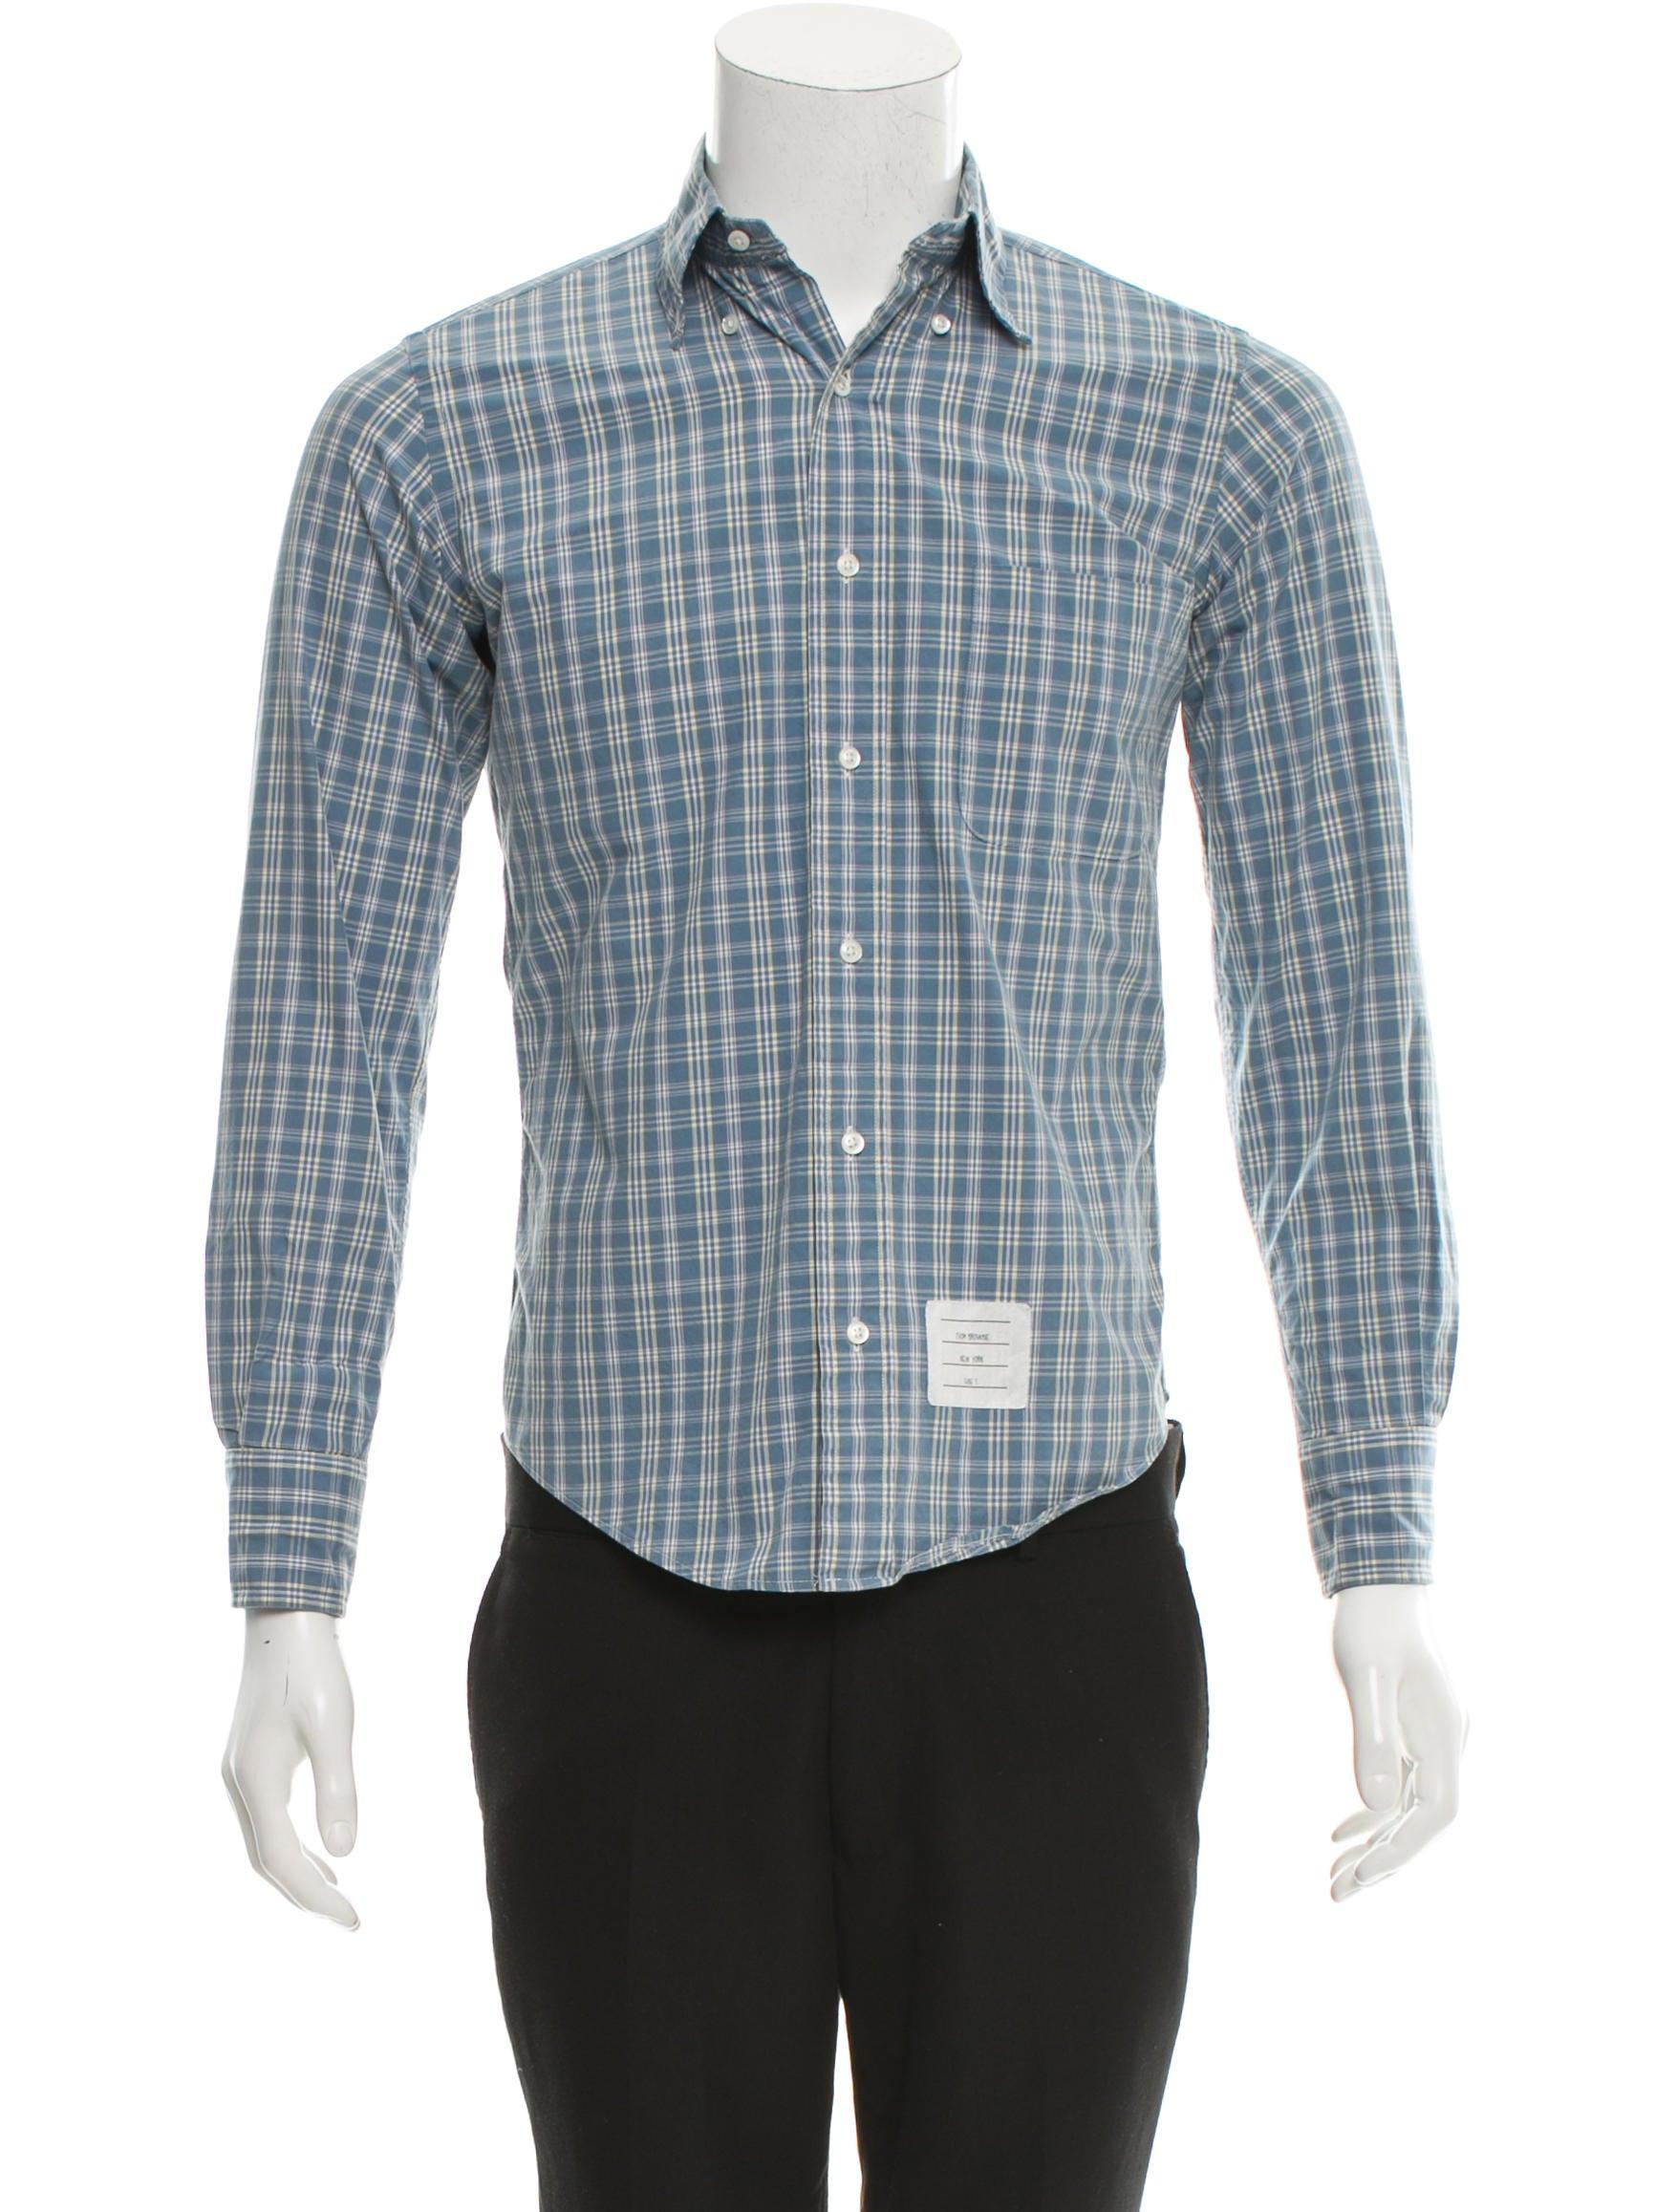 Thom browne plaid button up shirt clothing tho21085 for Thom browne shirt sale